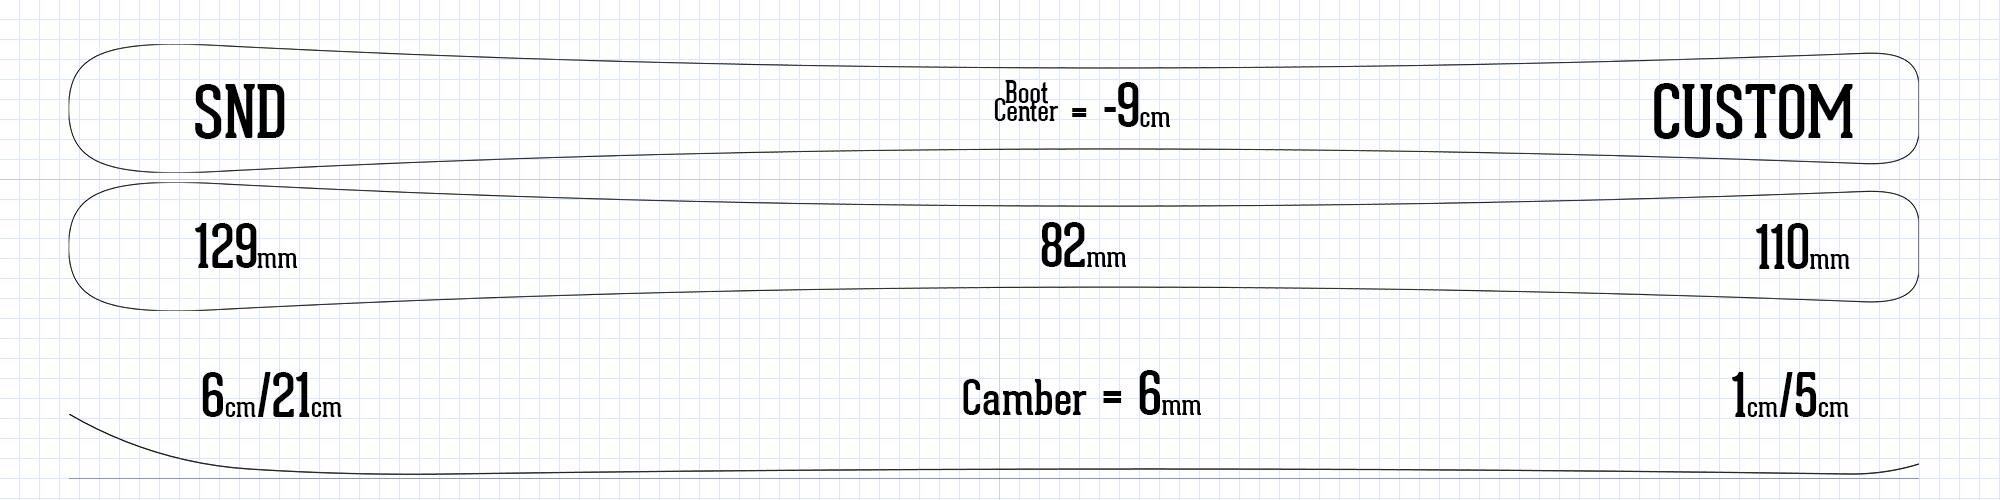 SND ski information rocker camber specs profile